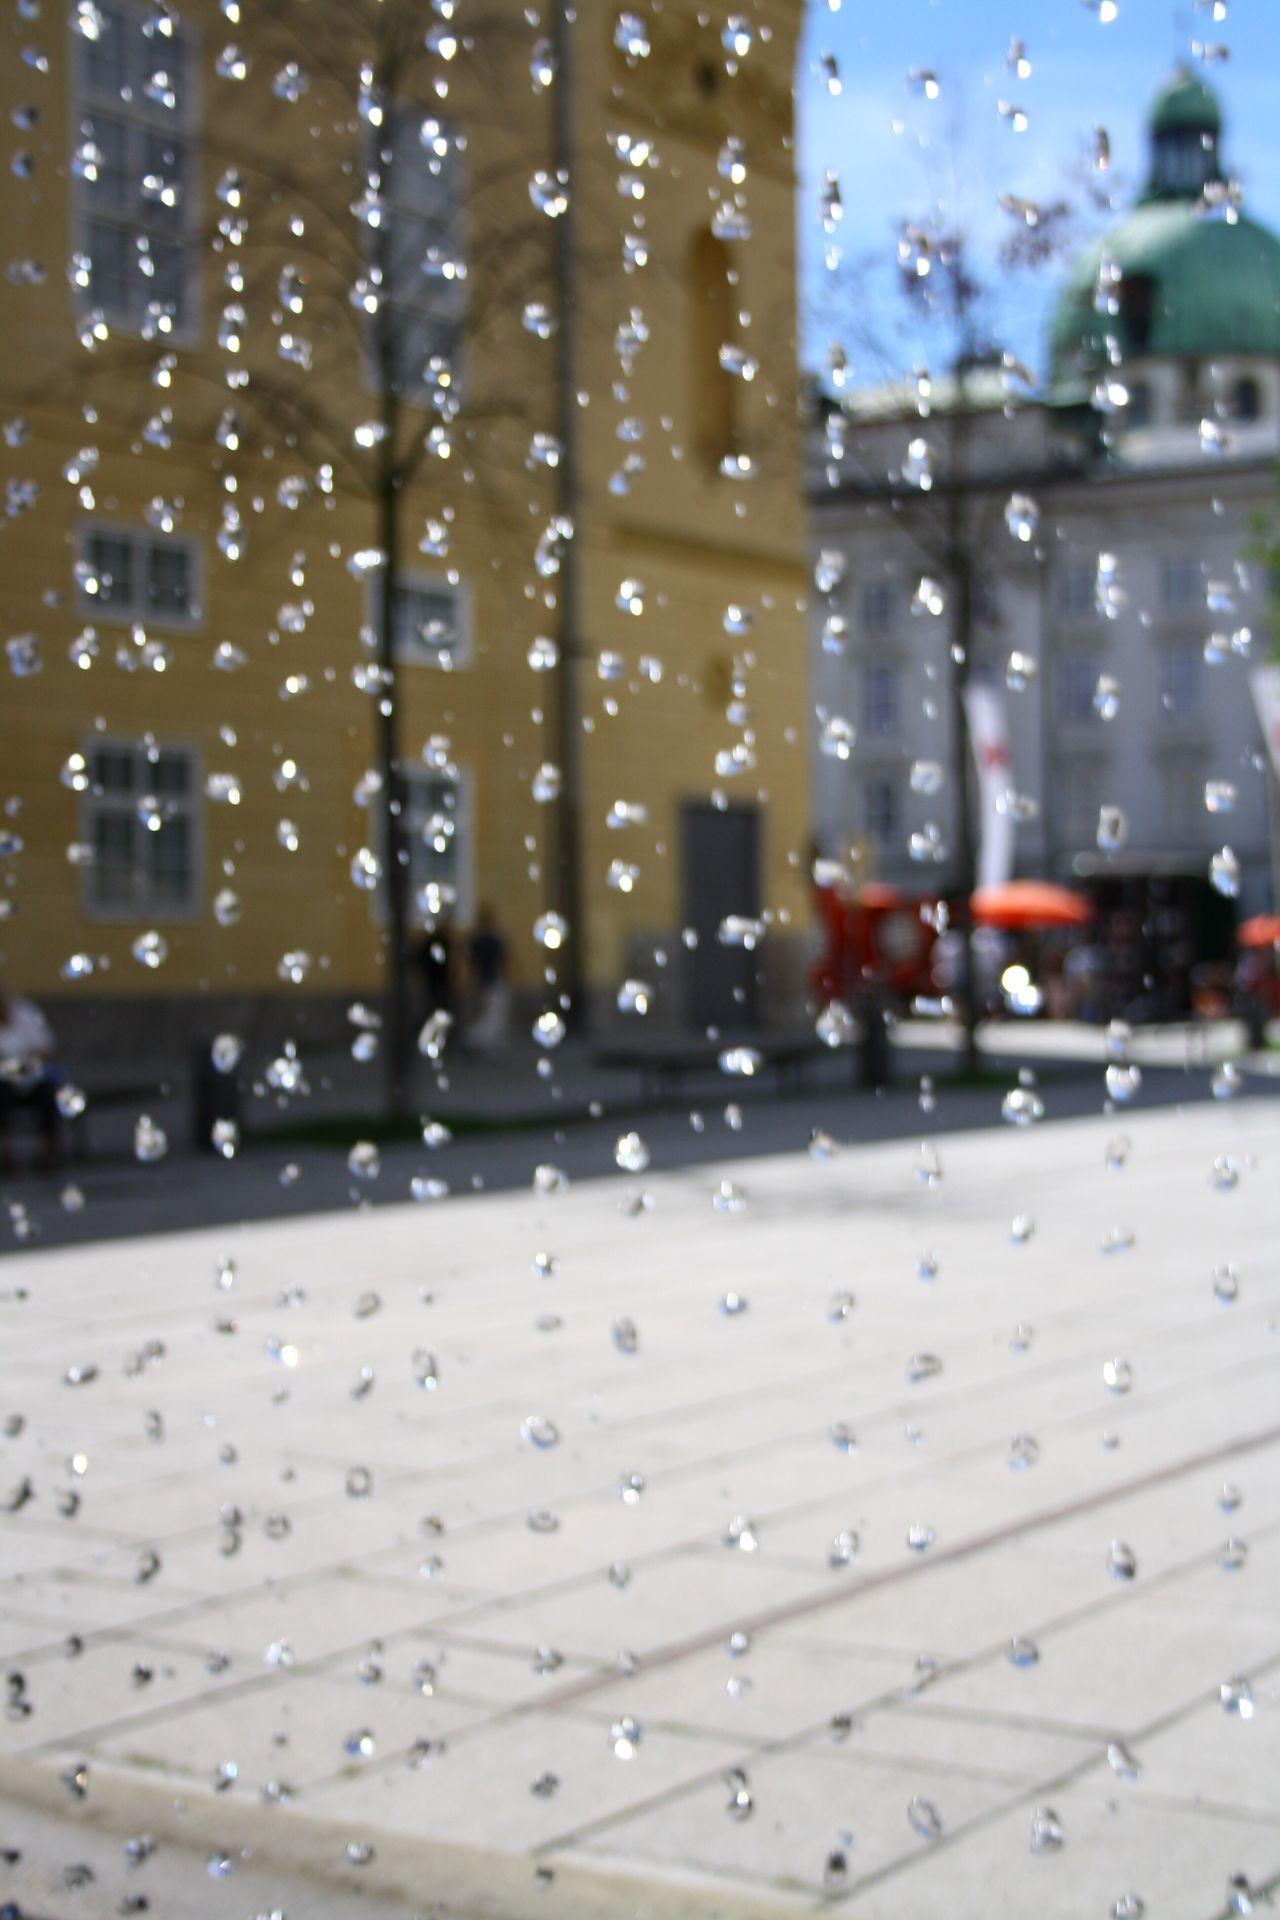 EyeEmNewHere Weather Drop Rain Wet Street RainDrop Fontaine Water No People Drops